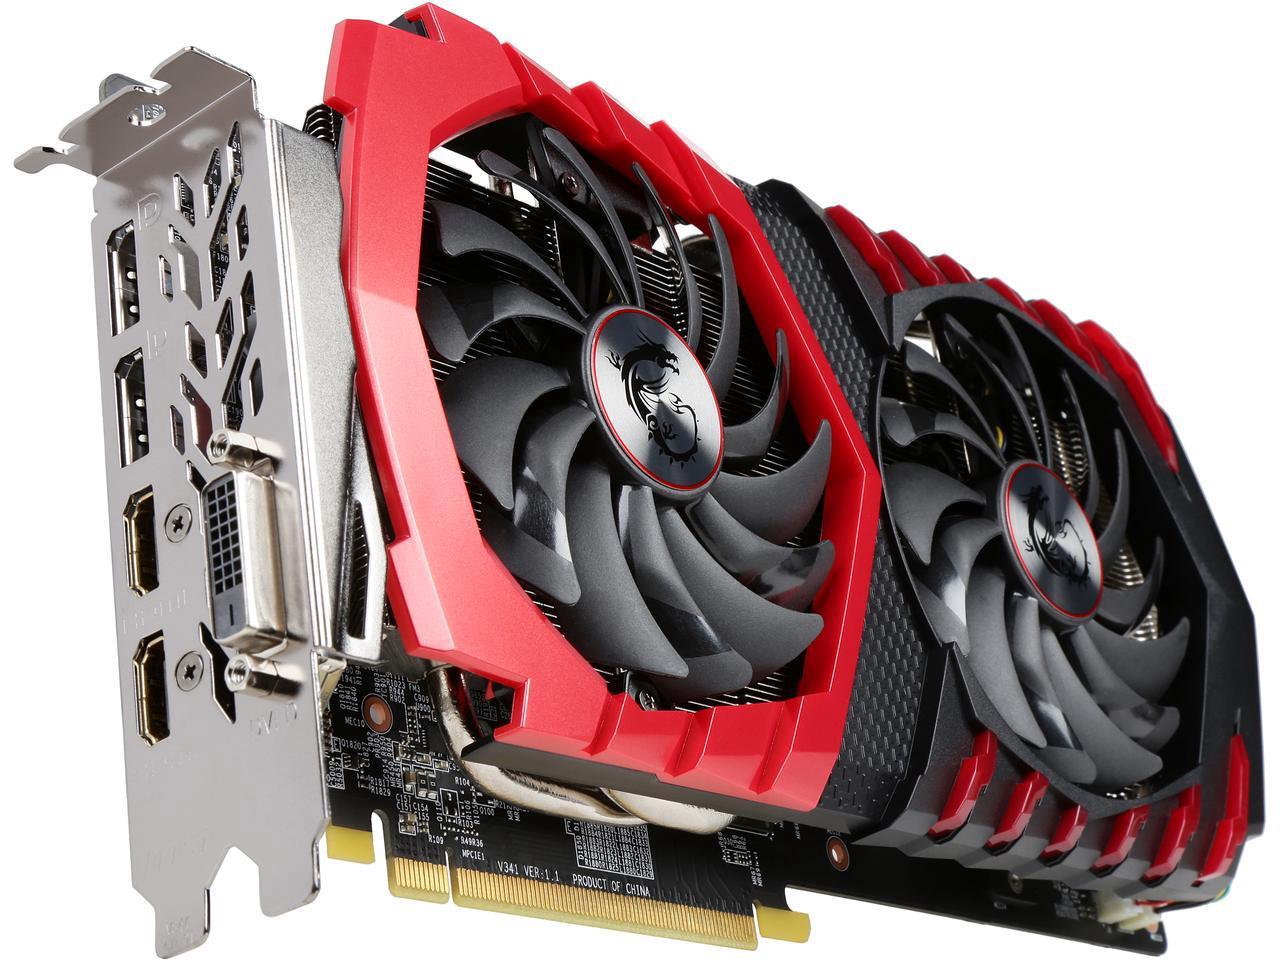 MSI Radeon RX 470 Gaming X Edition 8 GB 256-Bit GDDR5 PCI-Express 3.0 Video Card + Hitman (PC) for $164.99 AR + Free Shipping @ Newegg.com